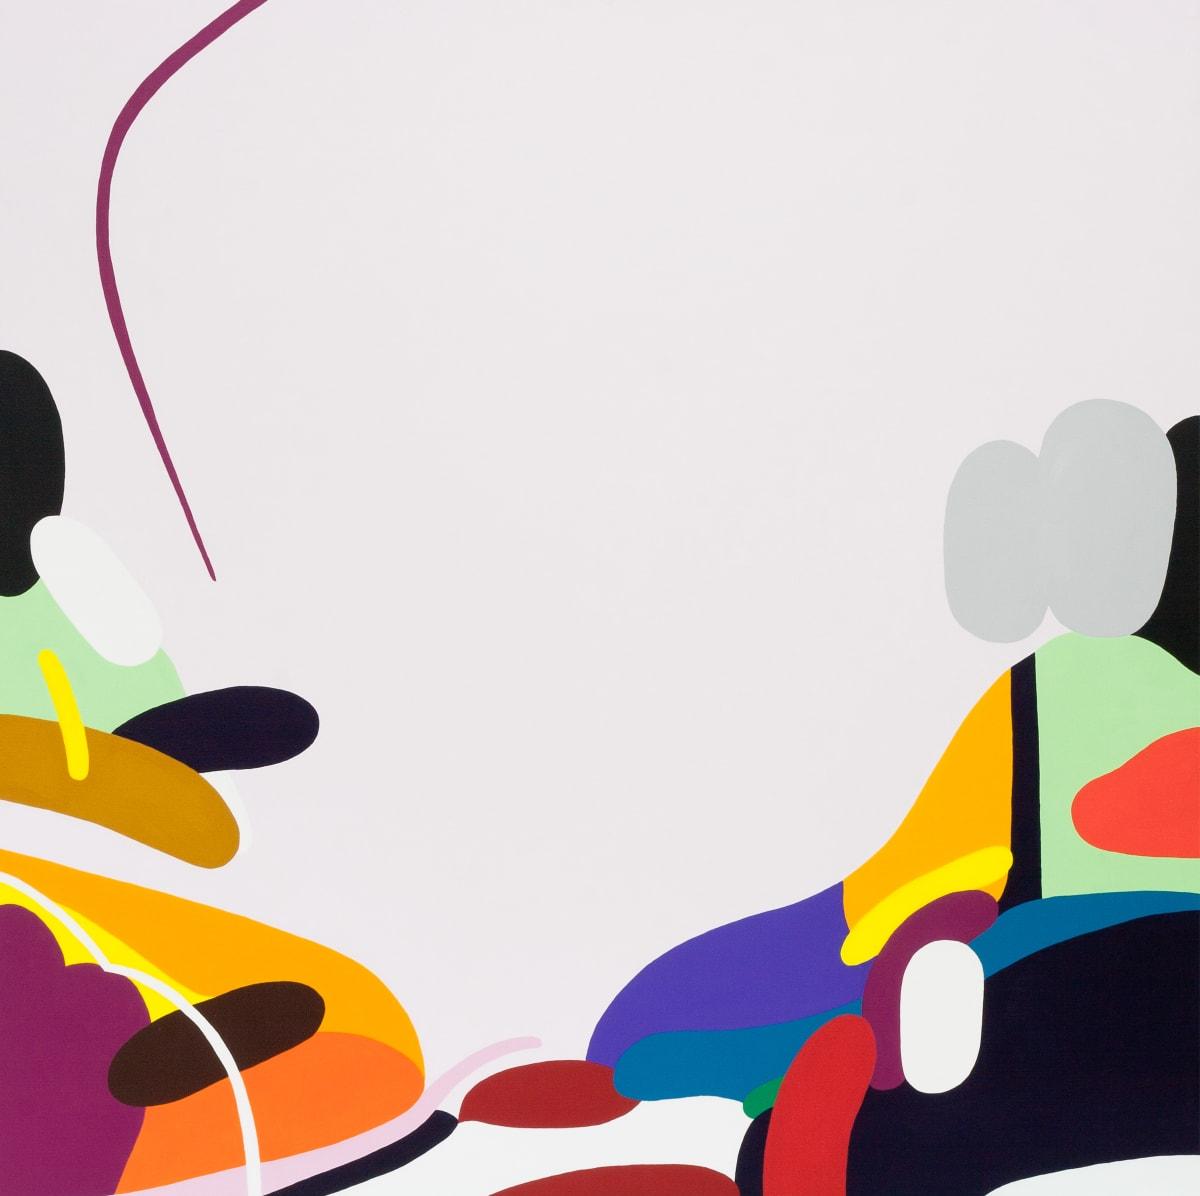 Kotaro Machiyama Find , 2016 Acrylic on Canvas 80.5 x 80.5 x 2.5 cm 31 3/4 x 31 3/4 x 1 in